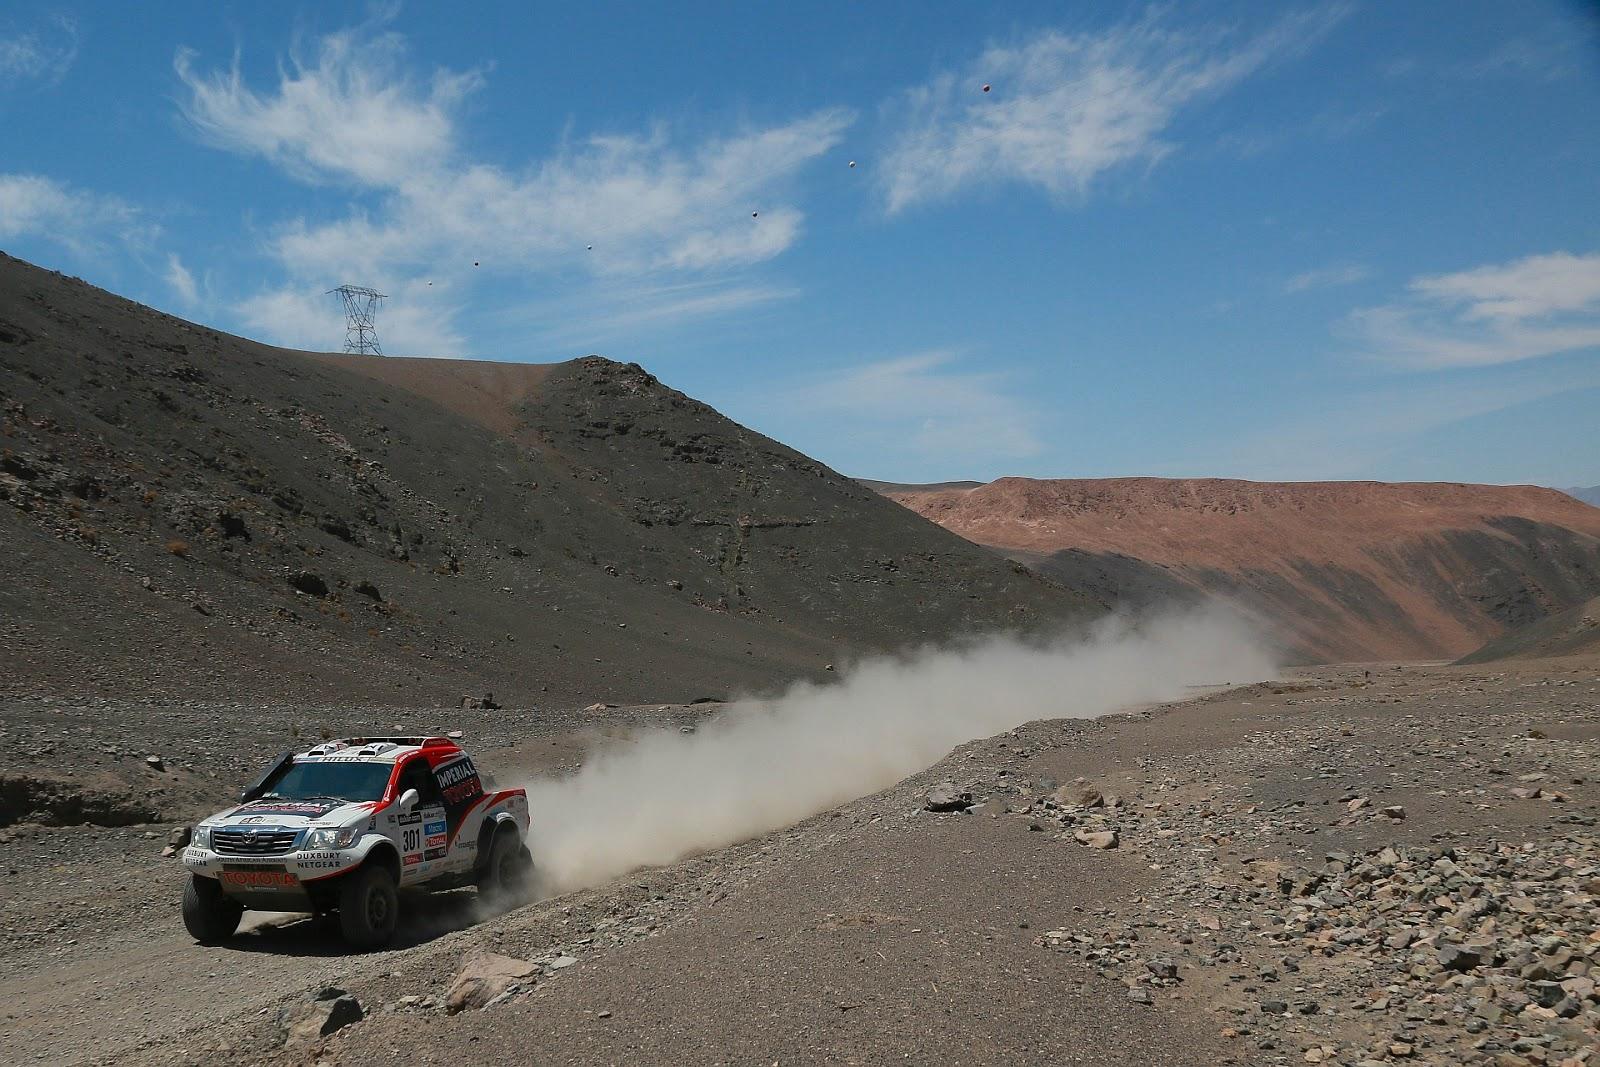 All Cars Logo Hd Dakar 2013 Team Toyota Sa Hot In Chile-8104